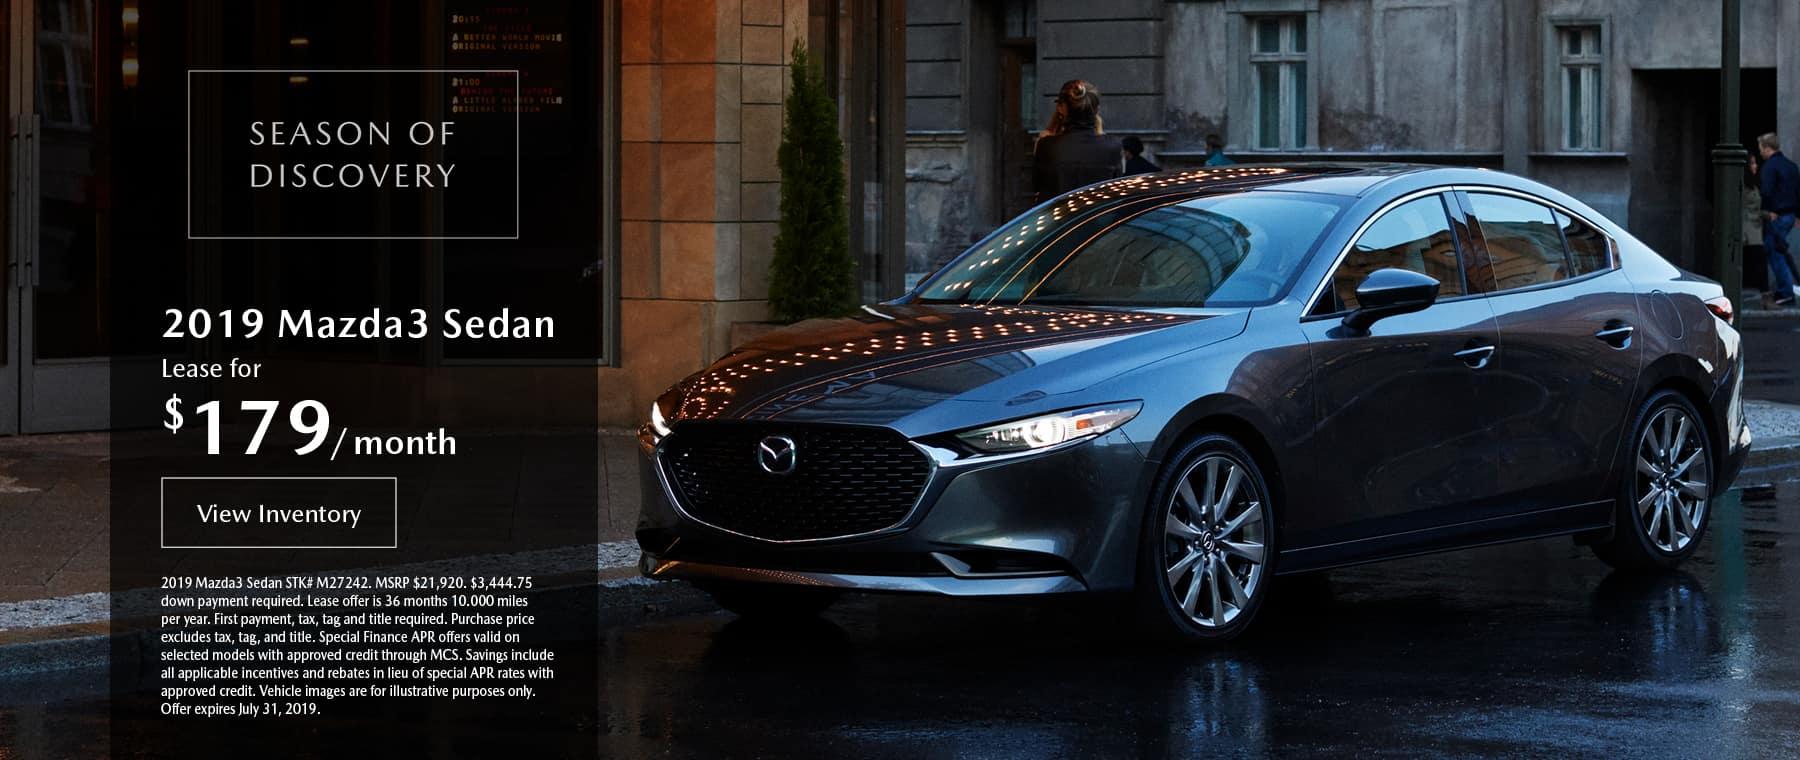 Lease the 2019 Mazda3 sedan for $179 per month, plus tax.